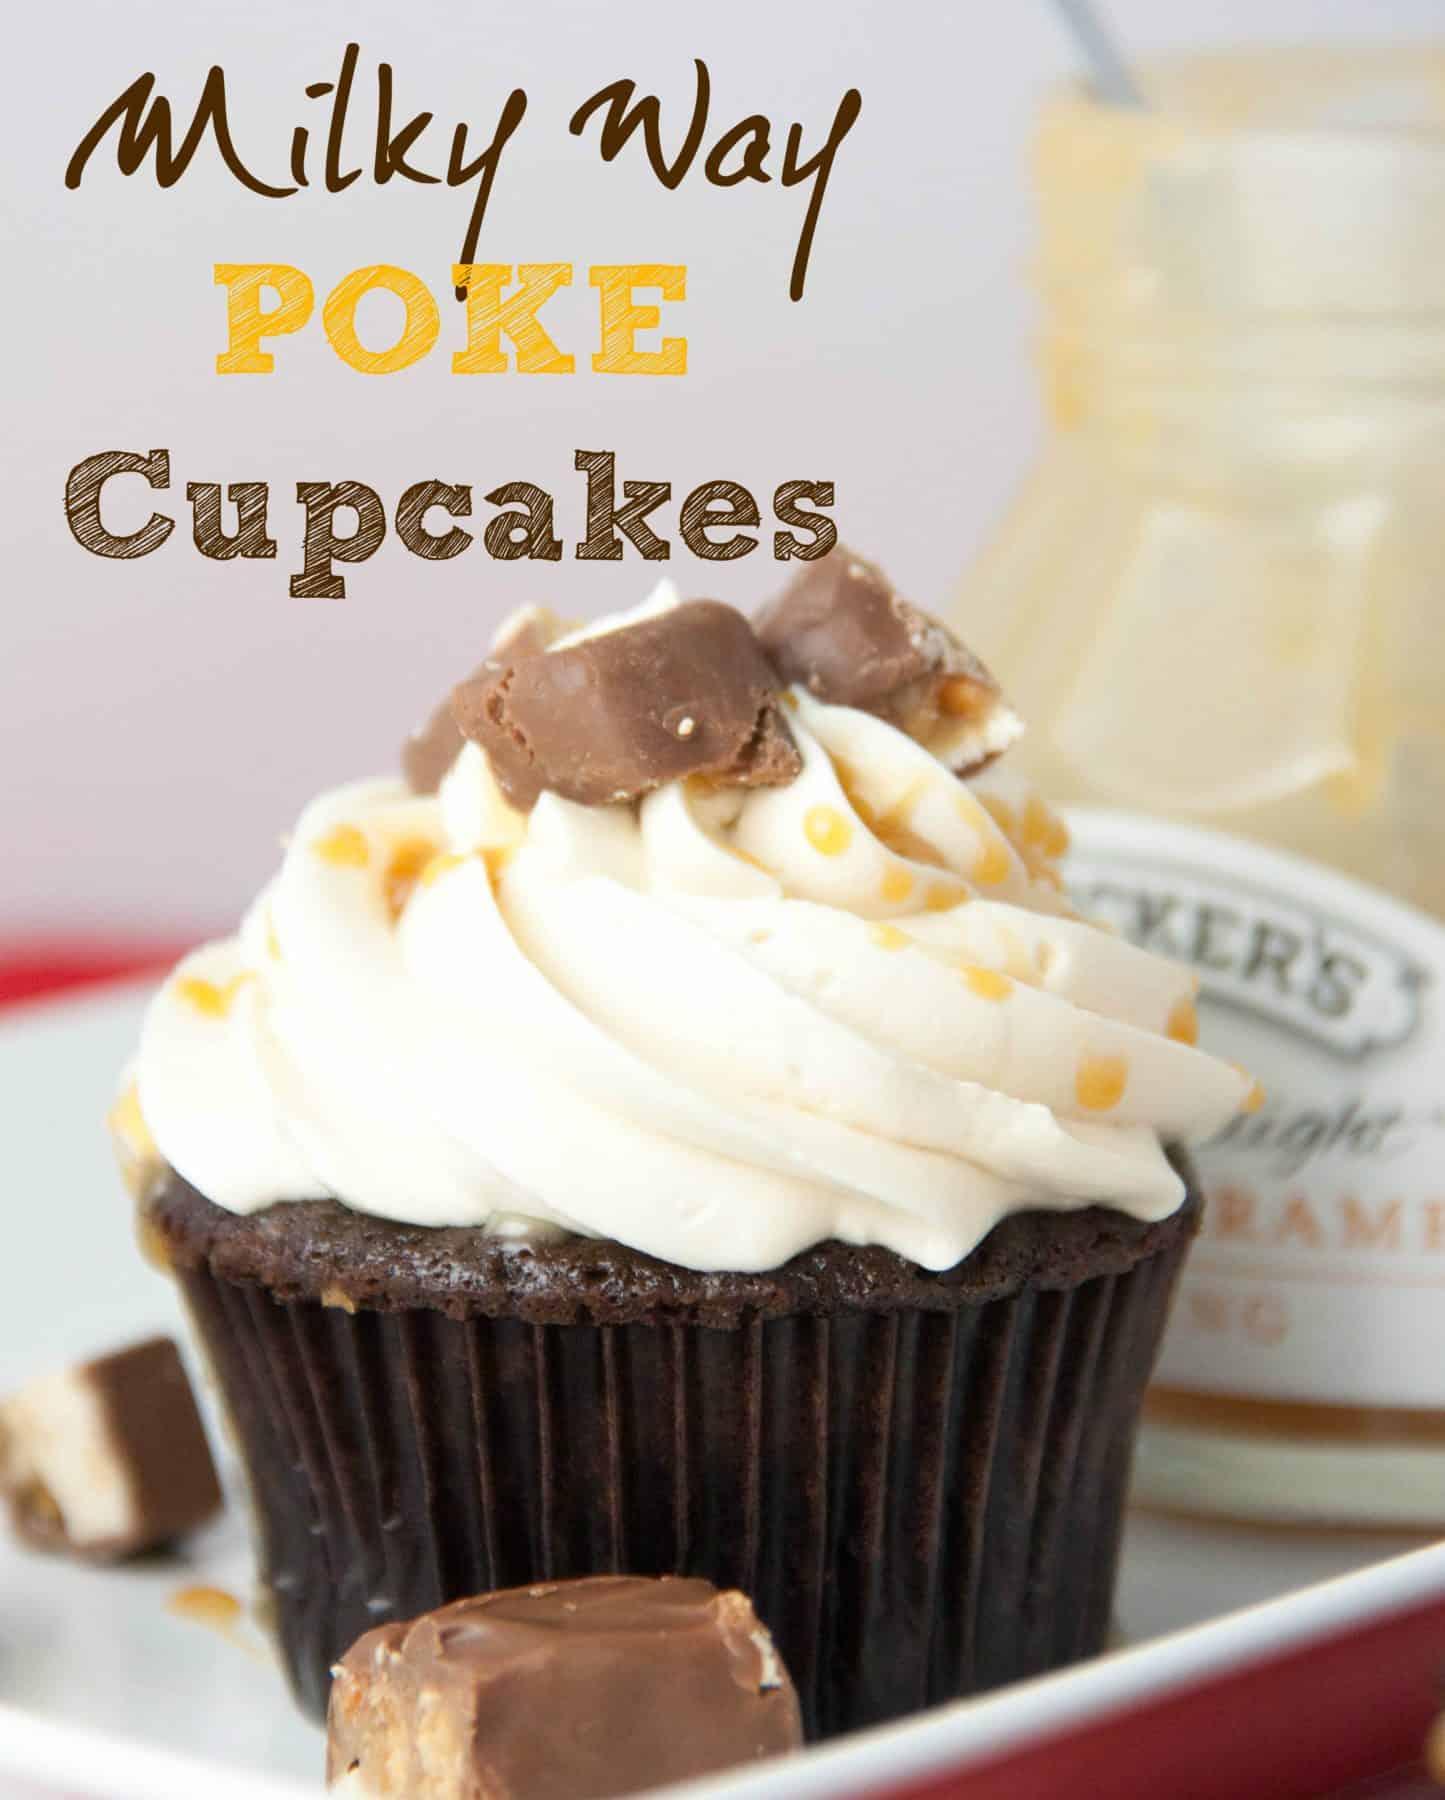 Milky Way Chocolate Poke Cupcakes - Boston Girl Bakes